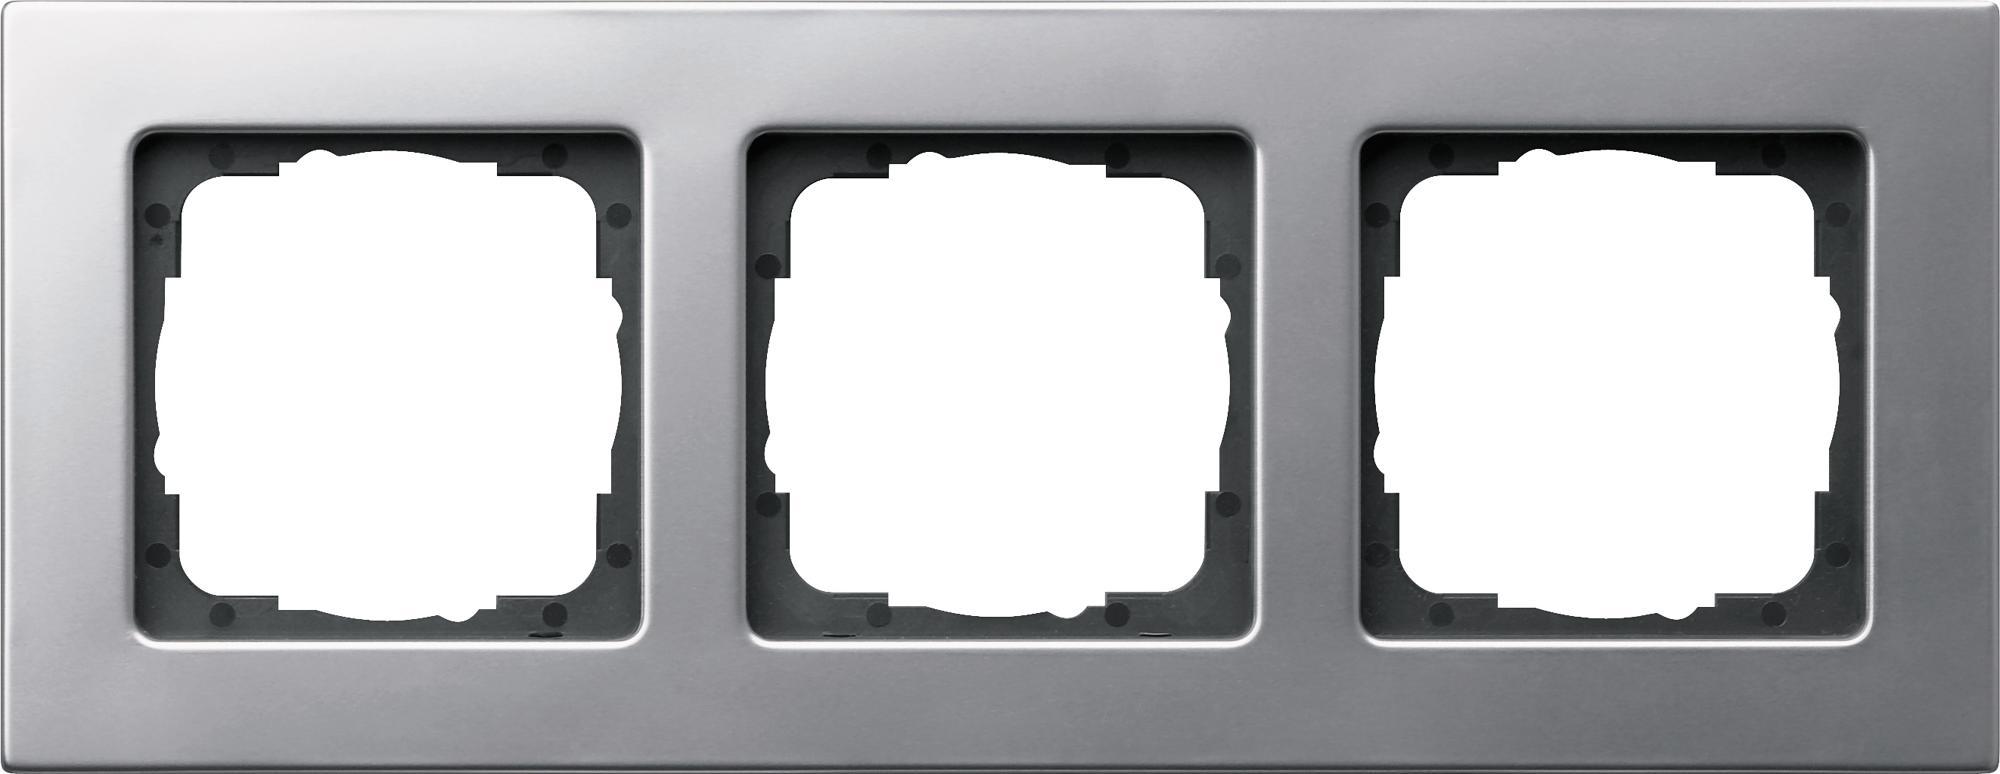 abdeckrahmen 3fach aluminiumfarben e22 gira 0213203 von gira bei elektroshop wagner. Black Bedroom Furniture Sets. Home Design Ideas